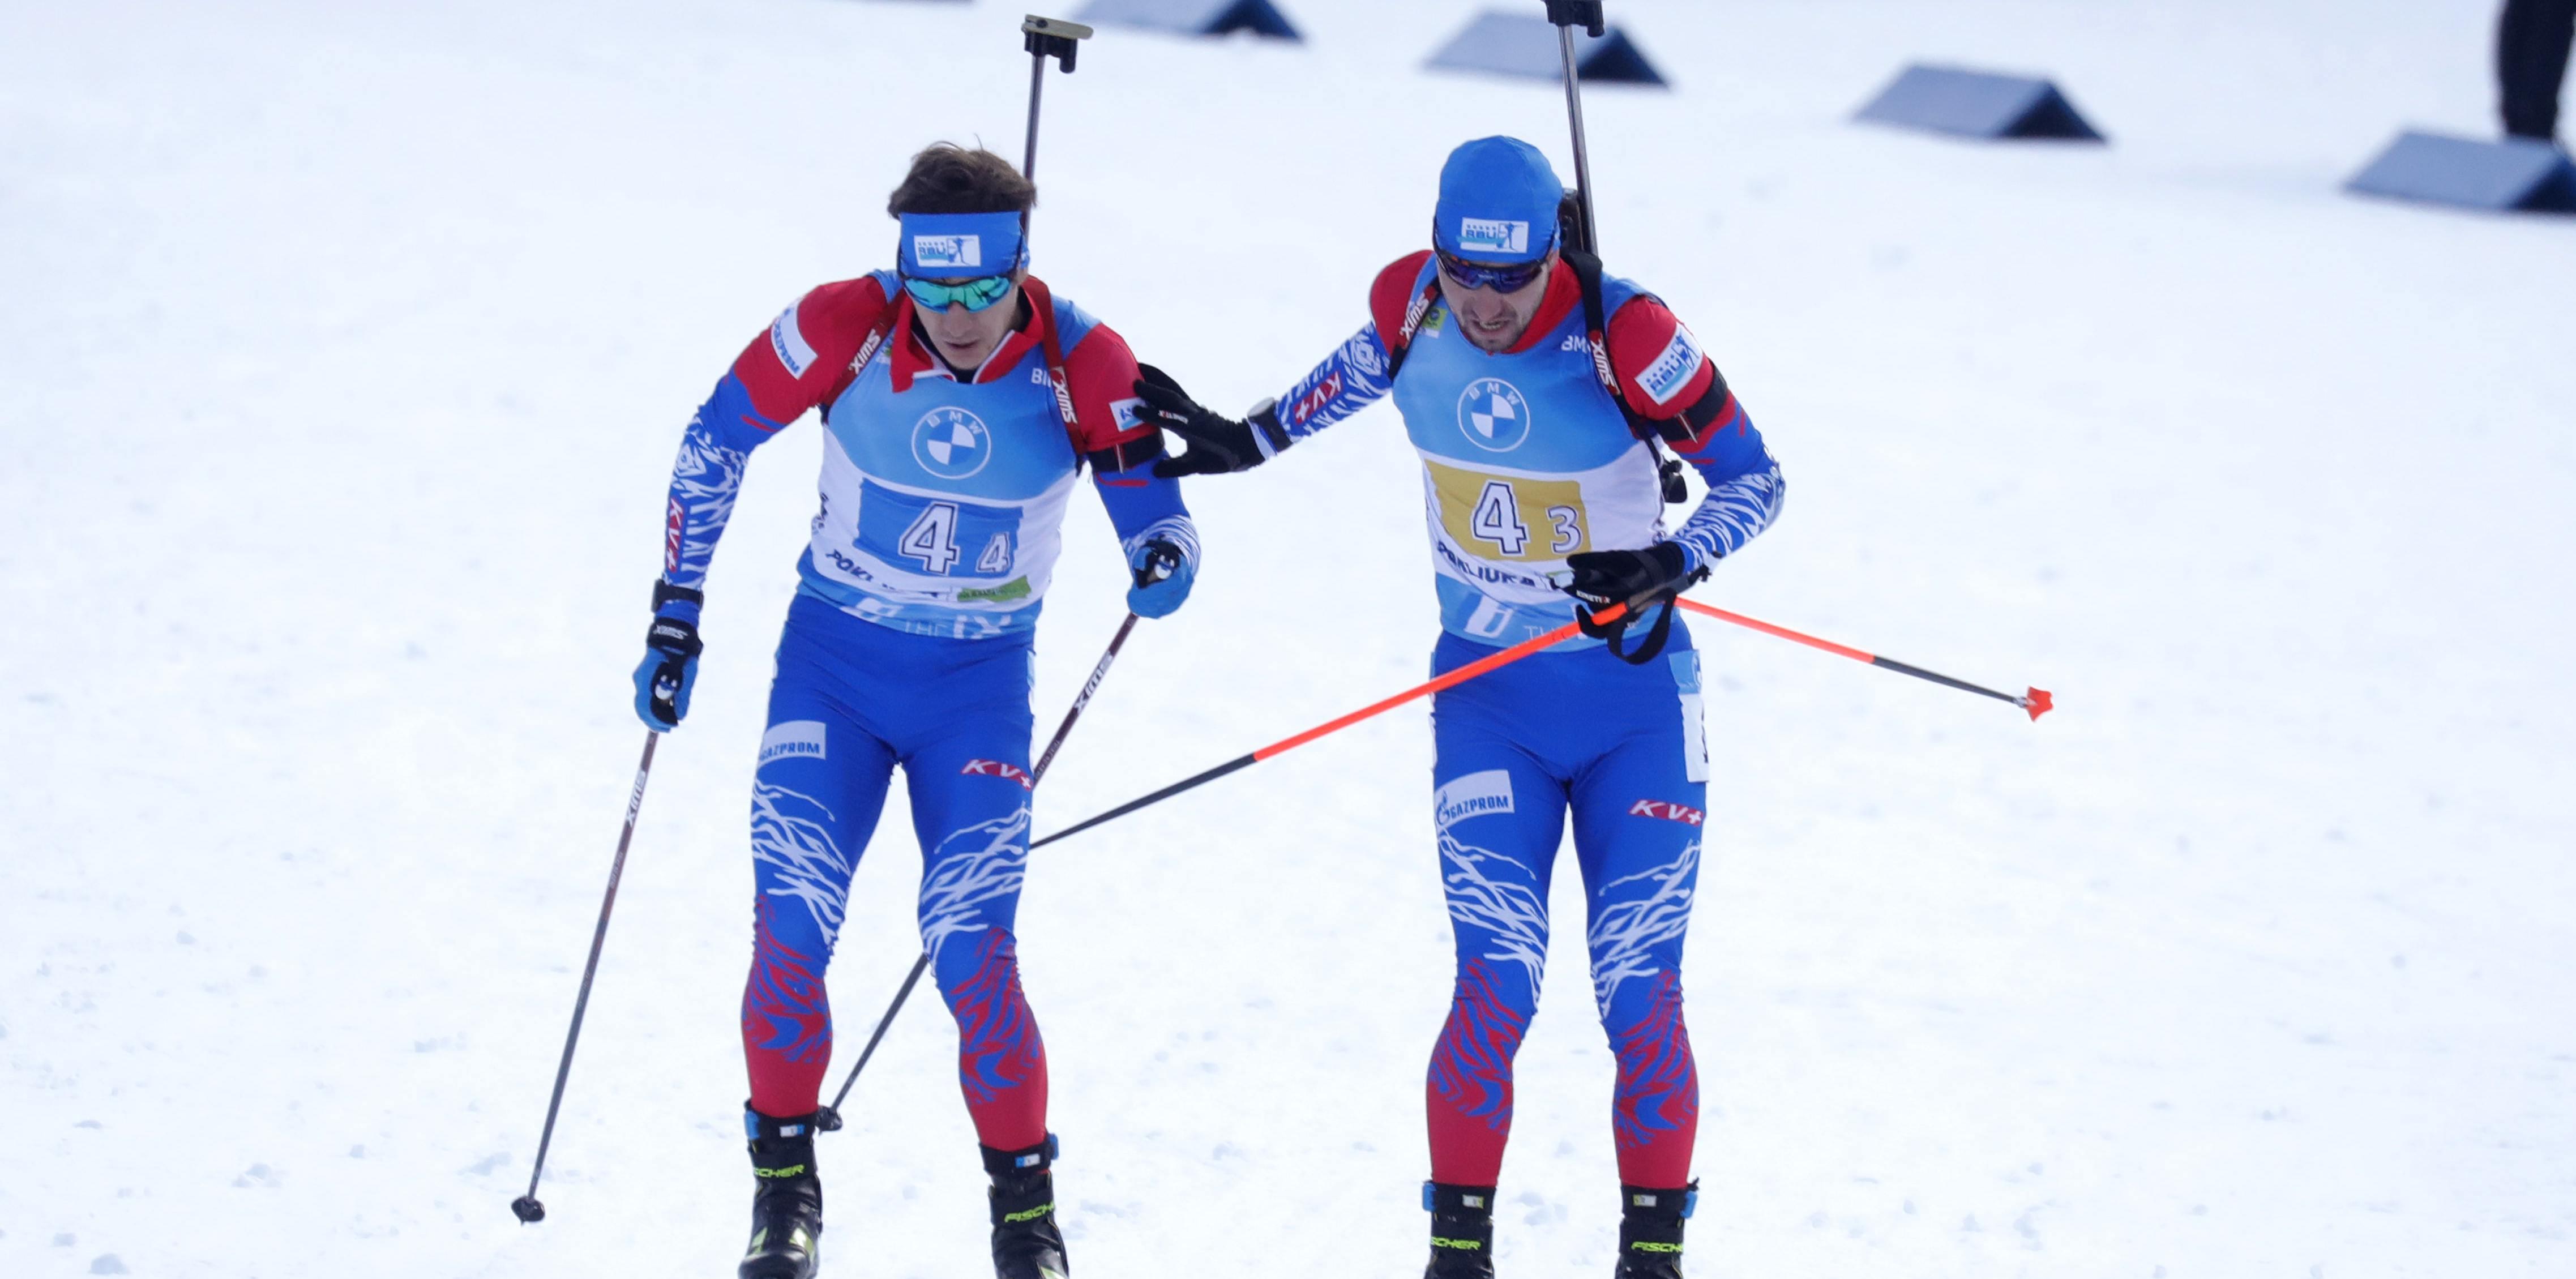 Владимир Аликин: После чемпионата мира позитива не вижу. Французы подарили нам бронзовую медаль - фото